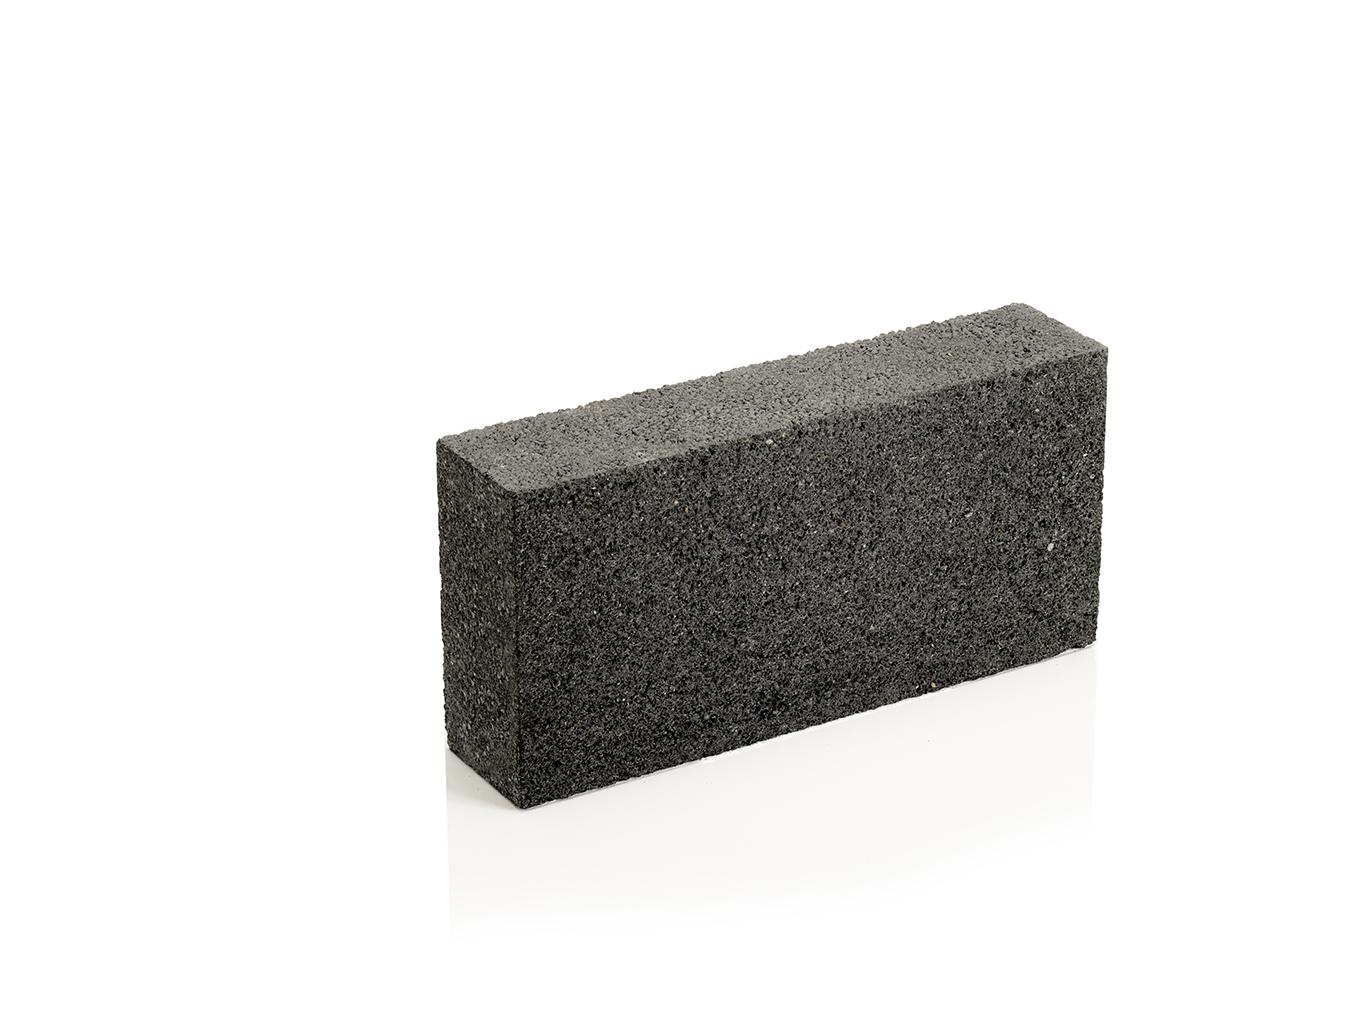 SIZED-Diamond Black Stippled Top.jpg